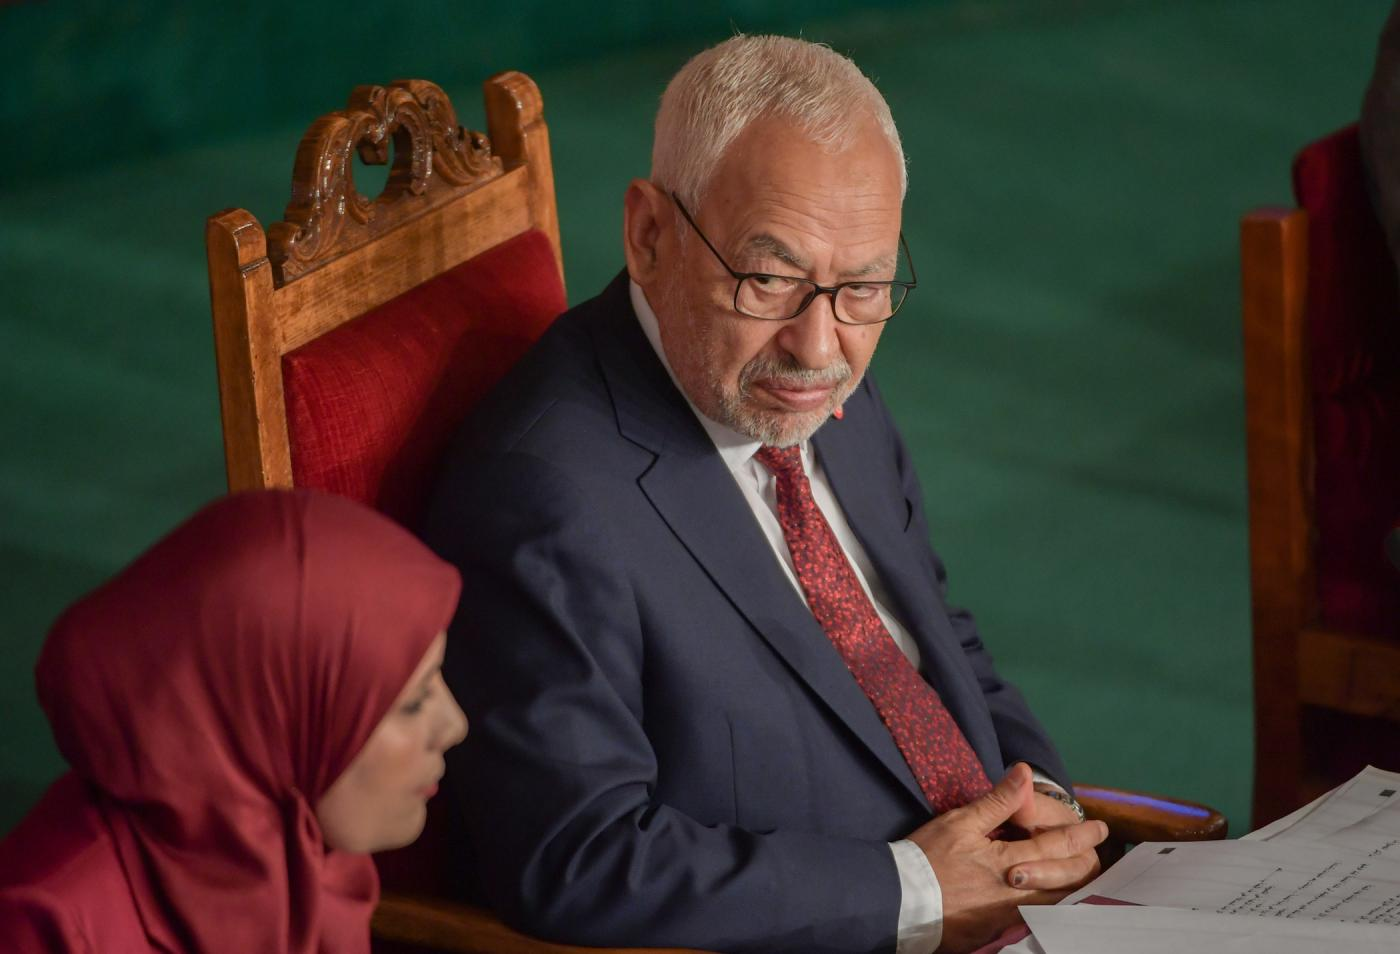 Tunisia Rached Ghannouchi AFP